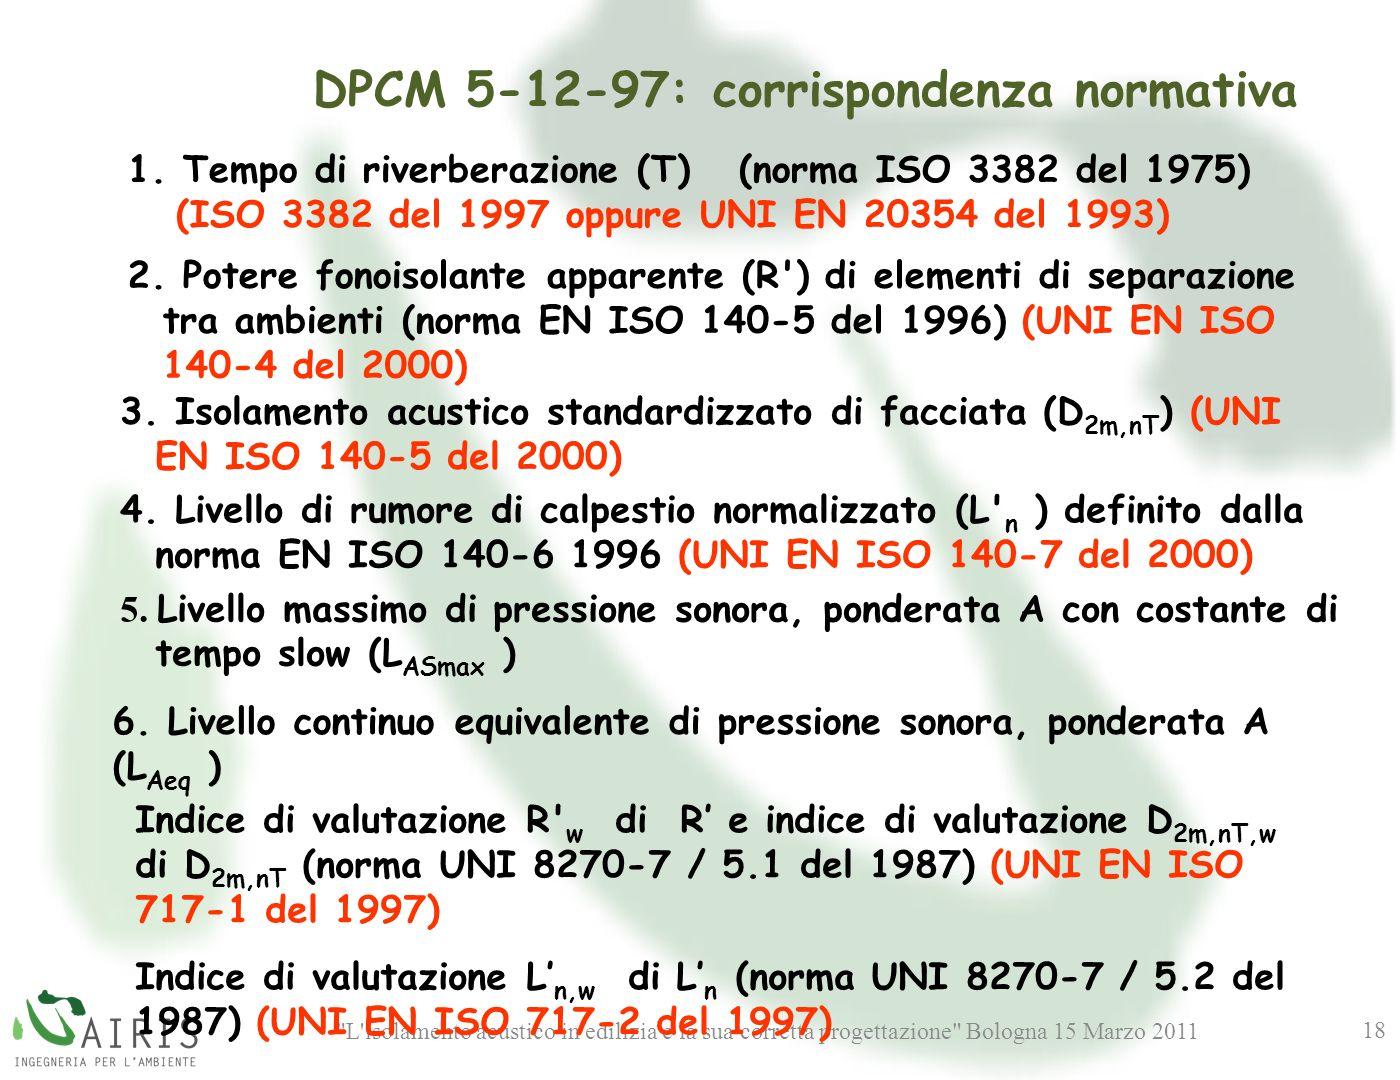 DPCM 5-12-97: corrispondenza normativa